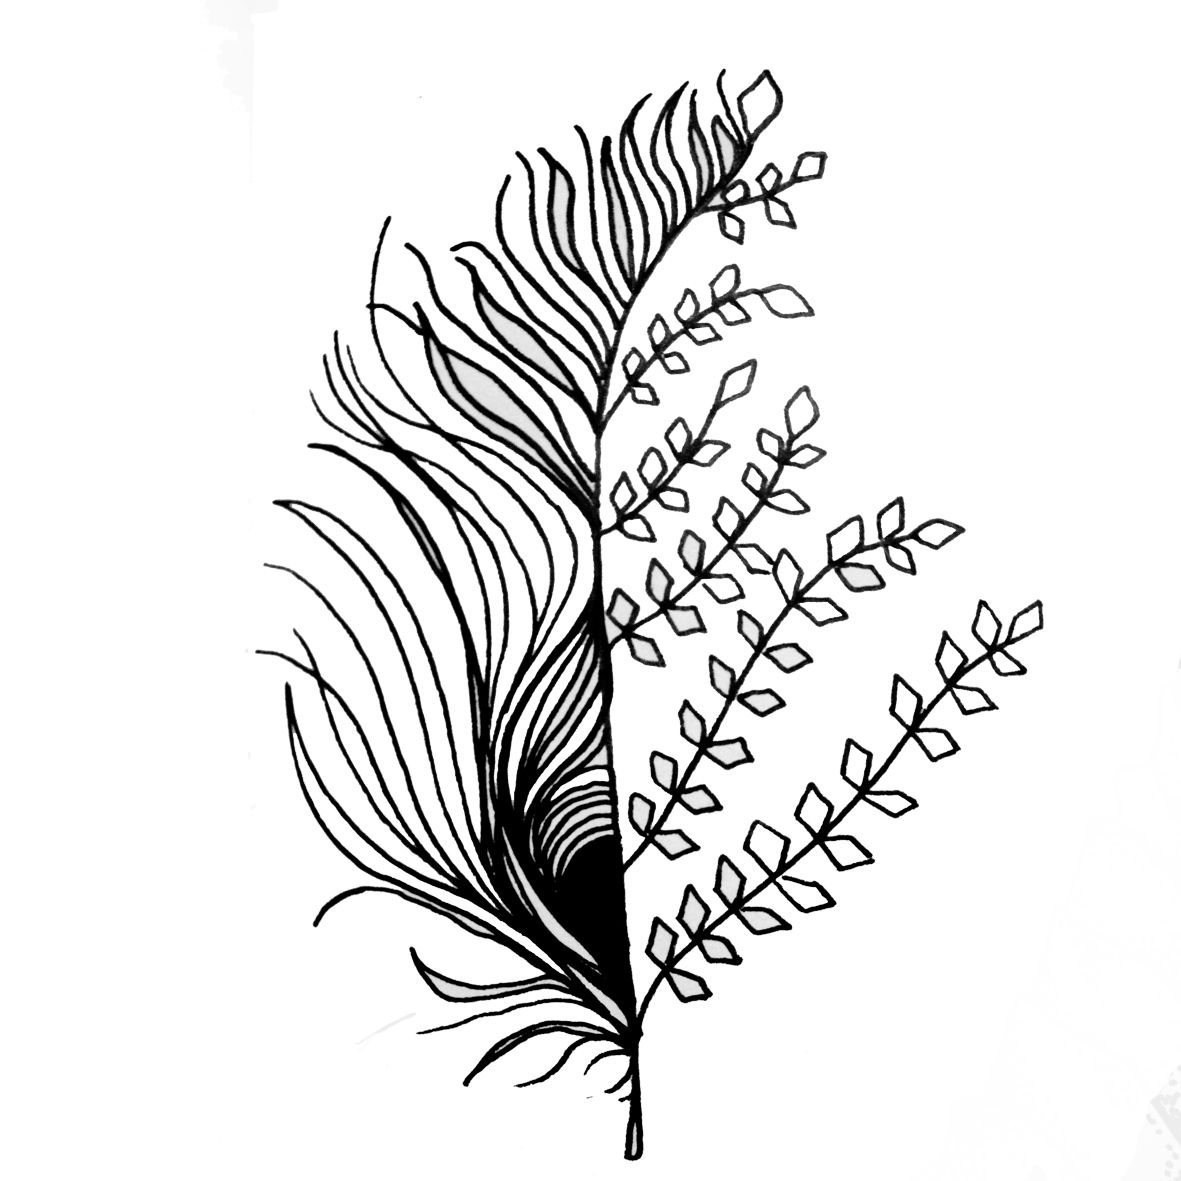 Tattoo plume feuille hybride feuille plume floral tattoo tatouage noir et blanc black 39 n - Tatouage trefle a 4 feuilles ...